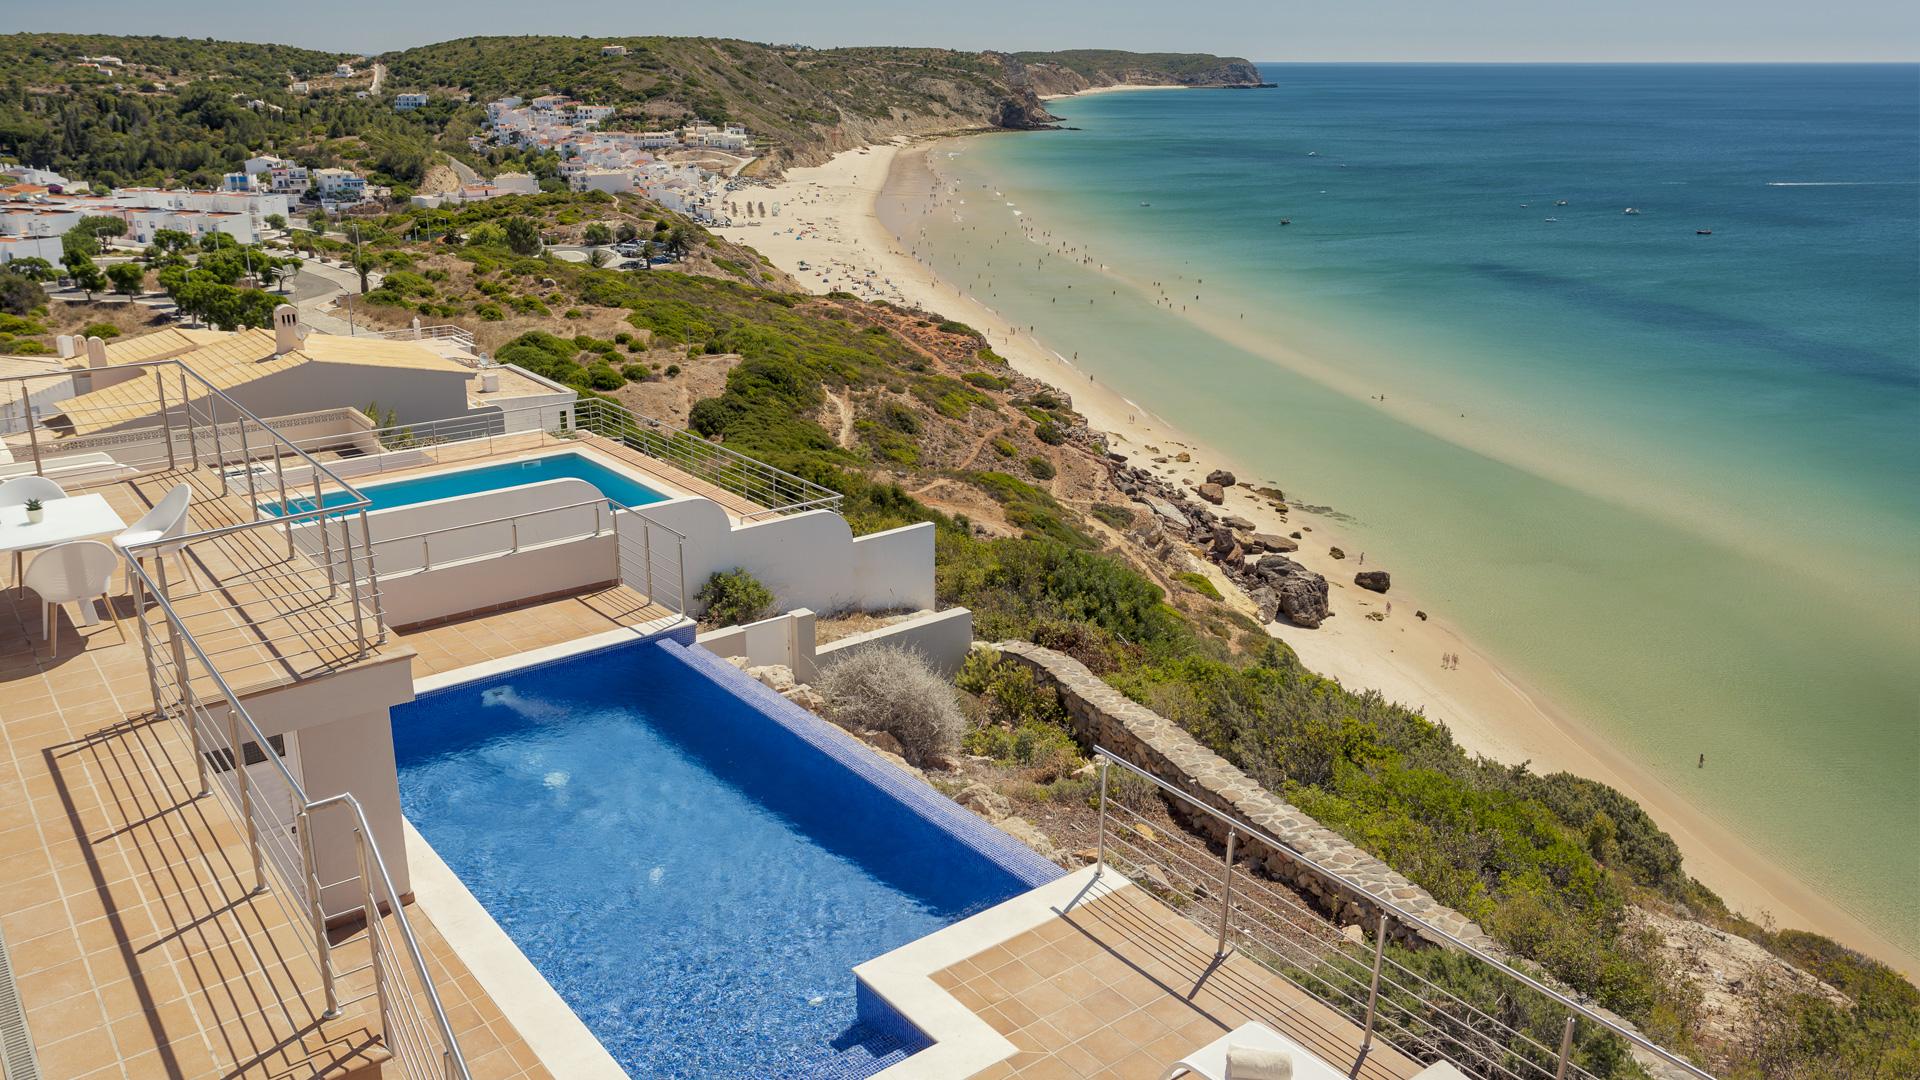 Mar à Vista terrasse, piscine et plage